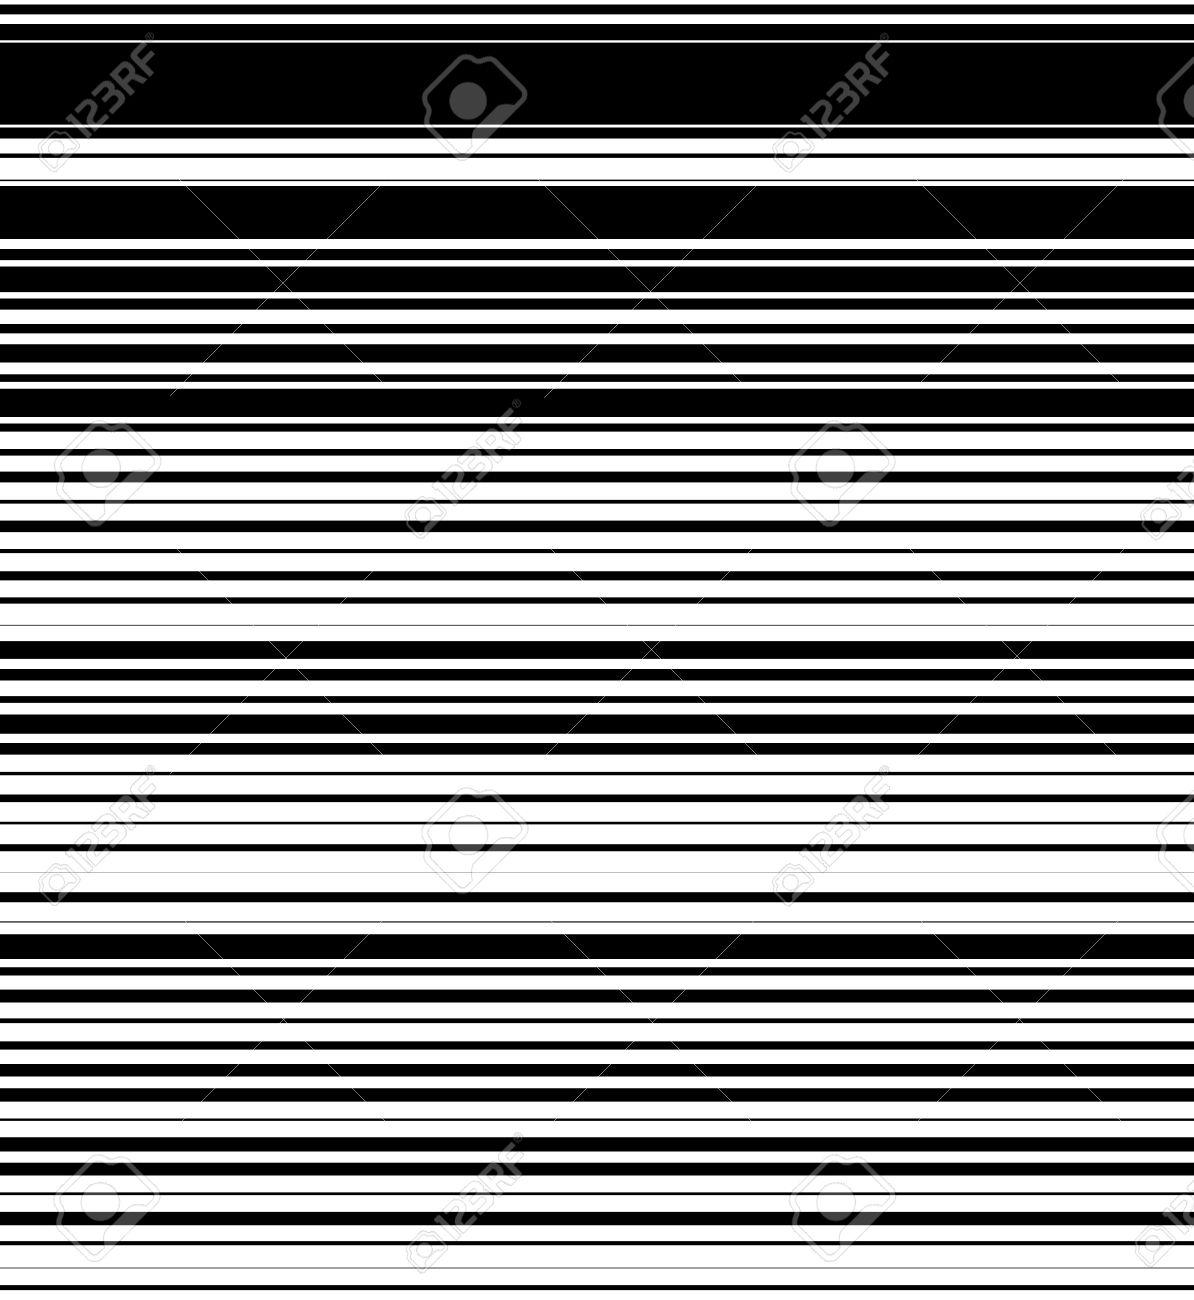 straight horizontal lines pattern with random thickness black rh 123rf com Photoshop Horizontal Lines Gray Thick Horizontal Line